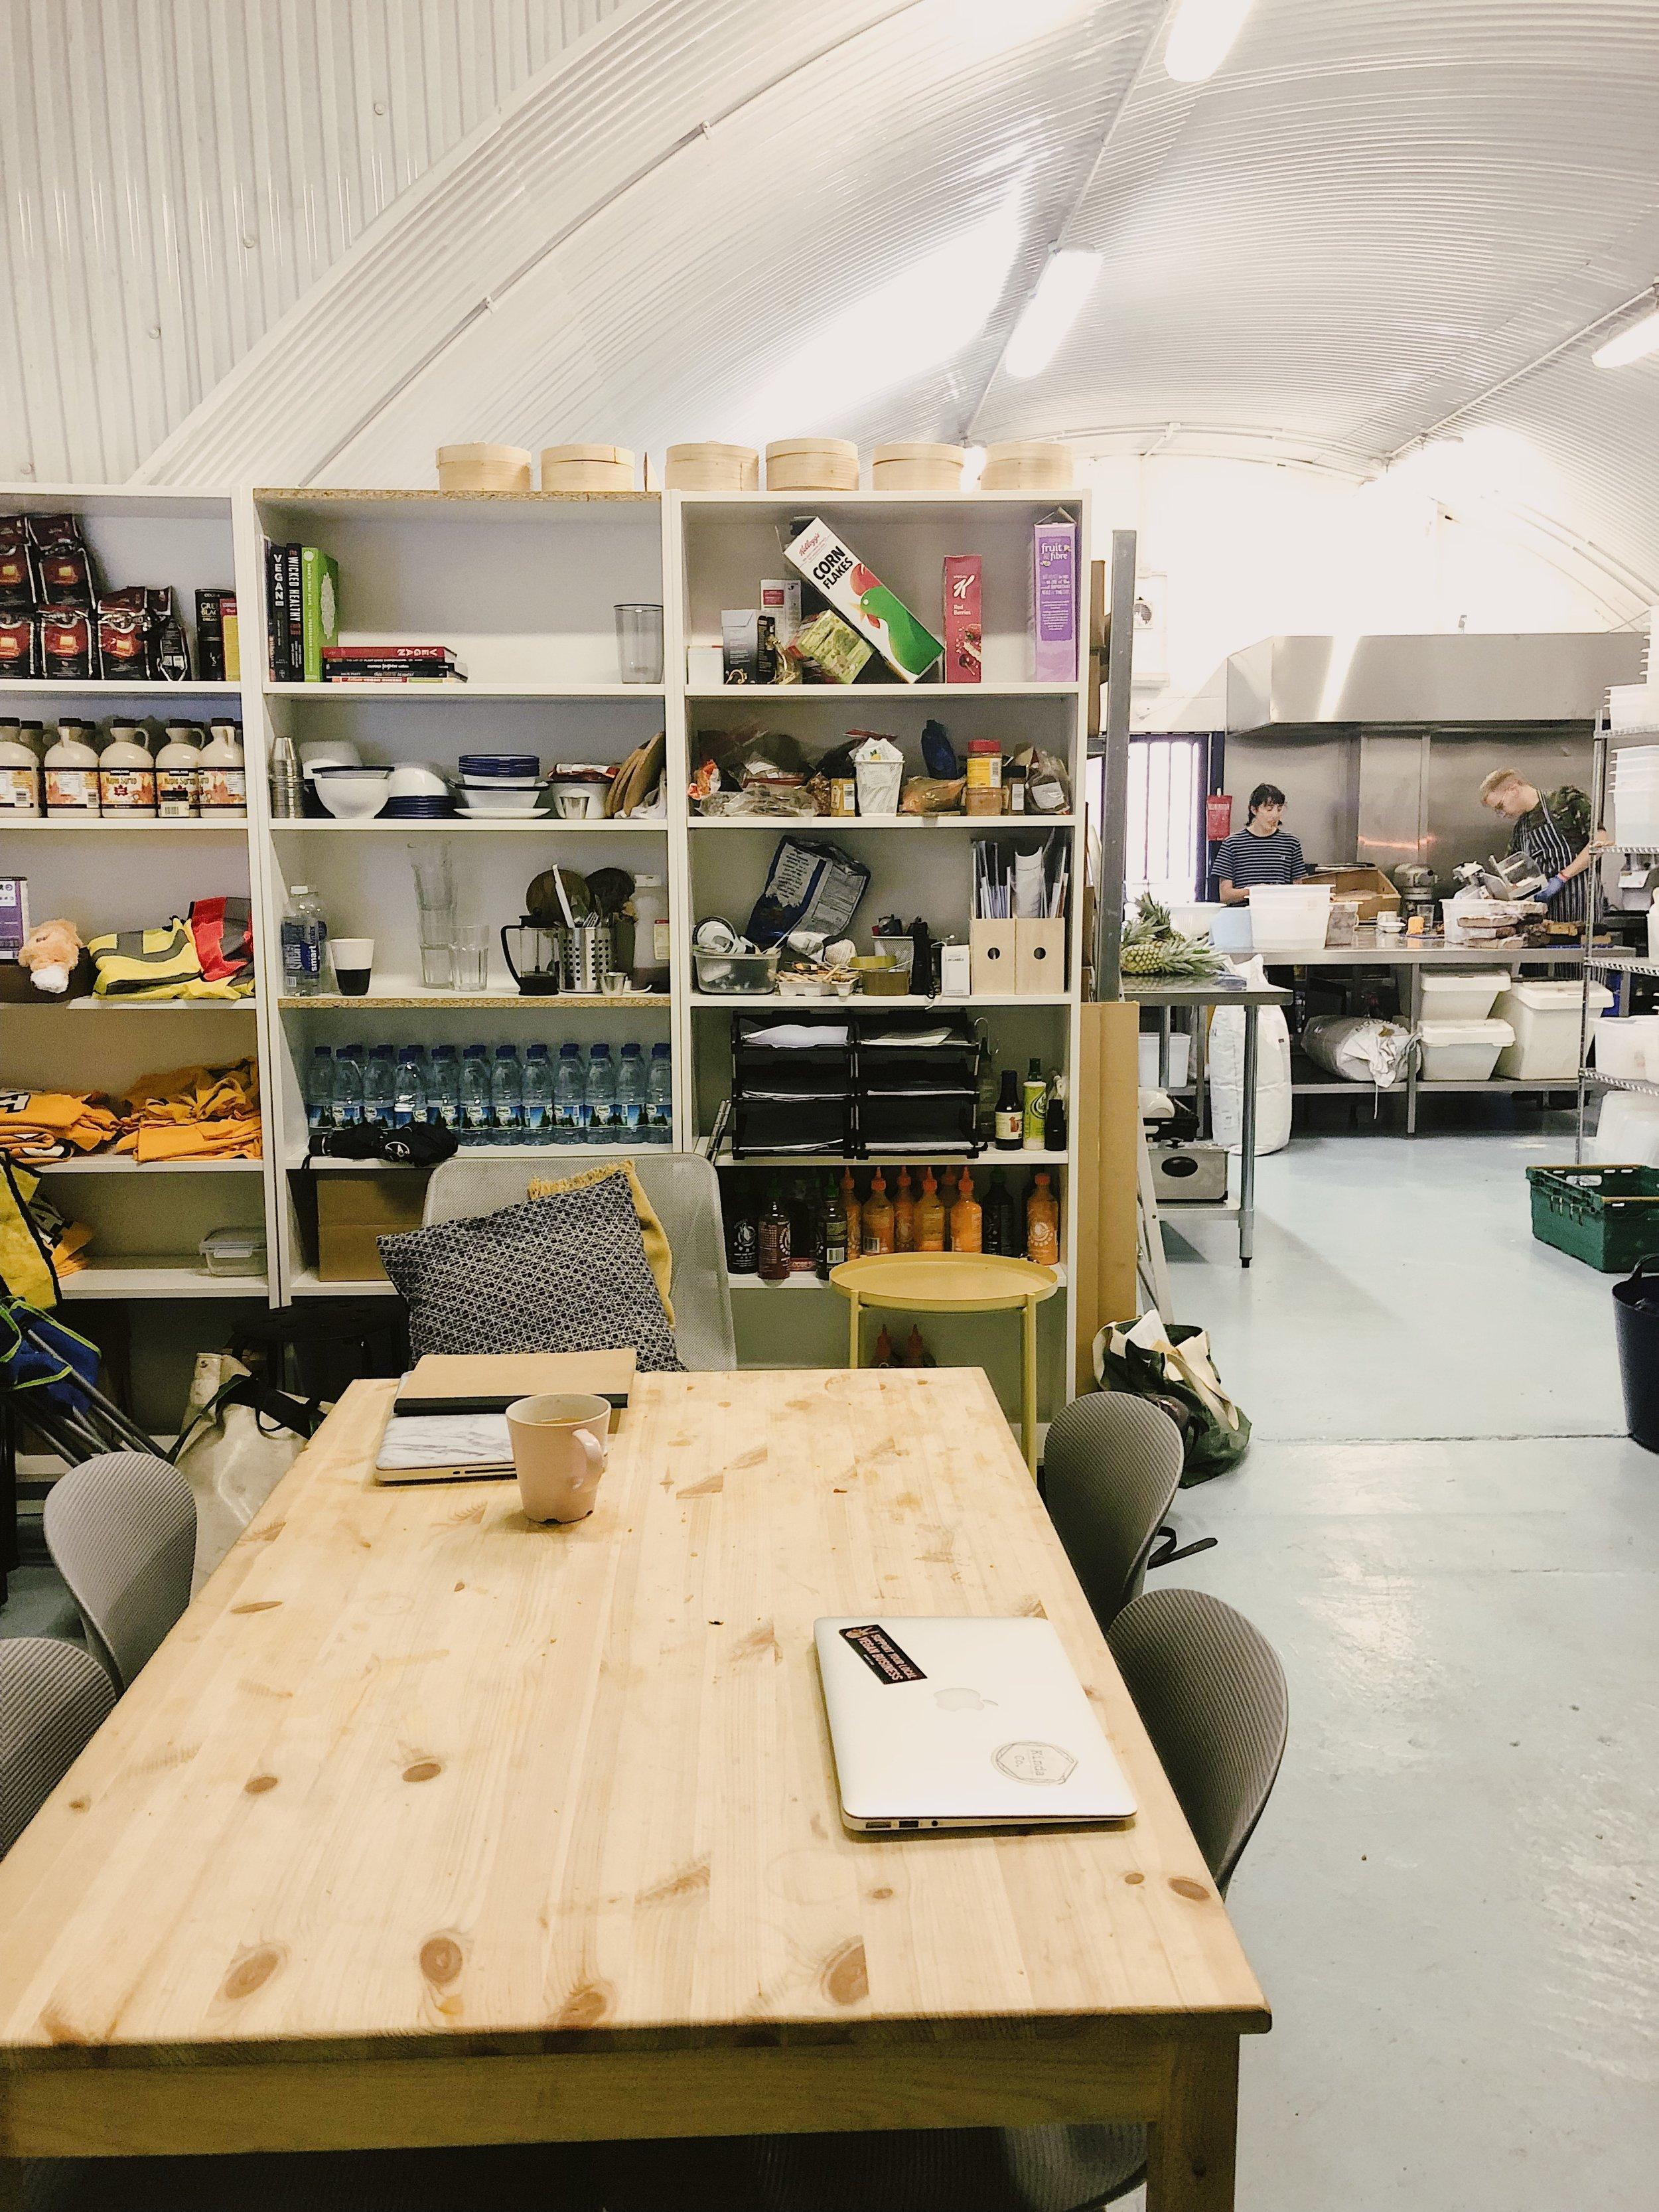 commercial.vegan.kitchen.hire.rent.shoreditch.spitafields.hackney.london.bow.east.1.jpg